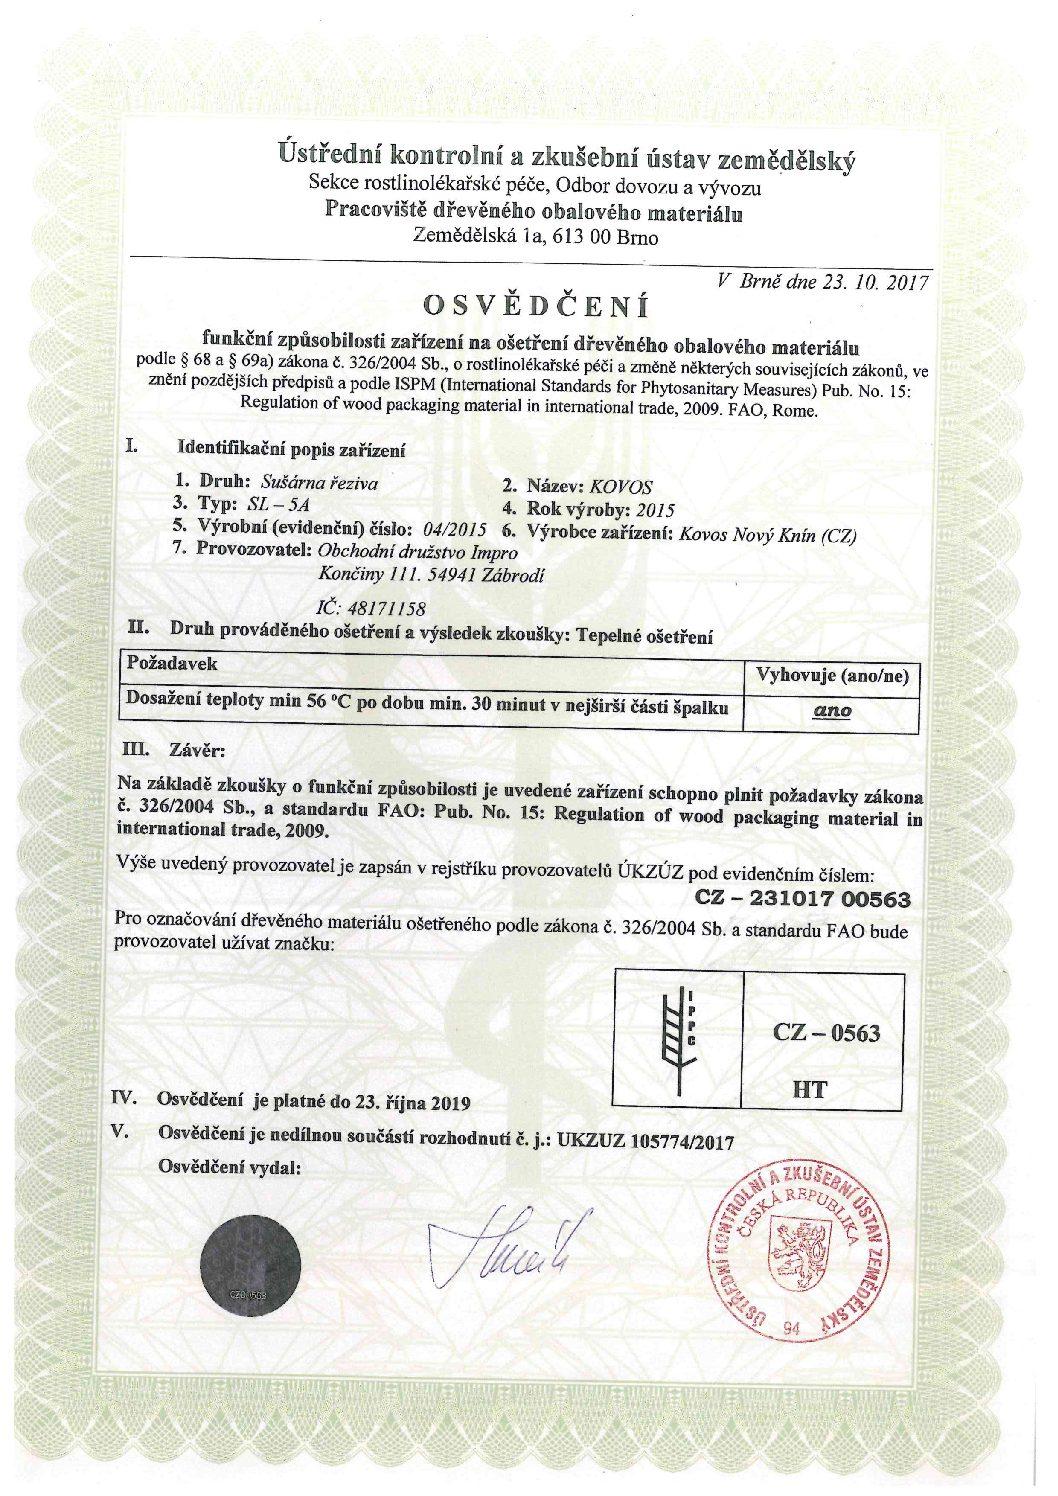 FYTO Certifikát